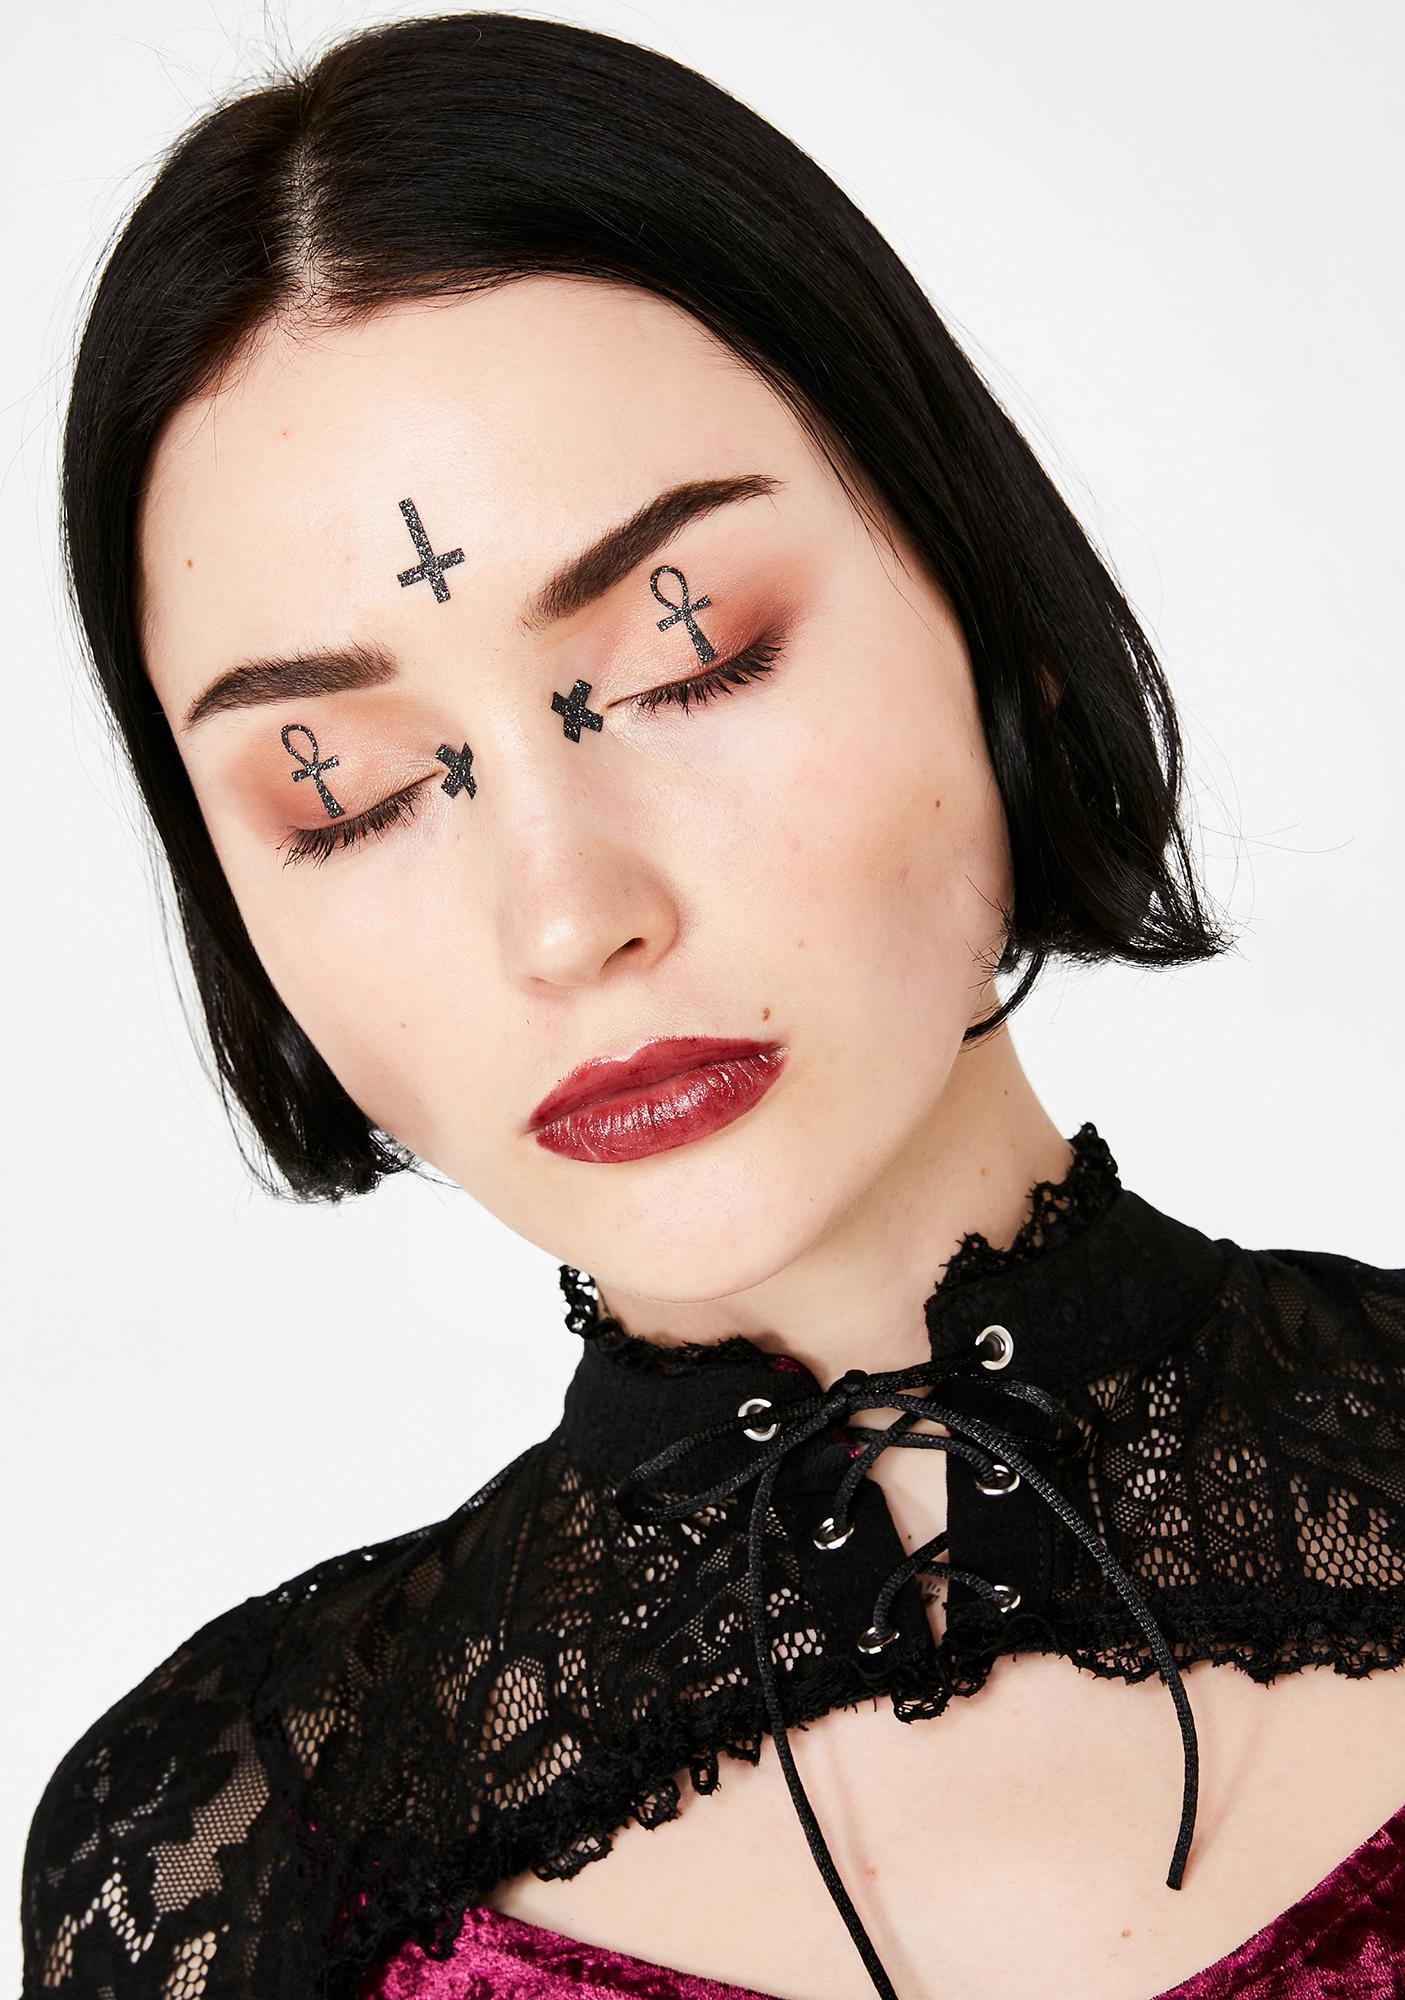 Stinnys Cross Marks Body N' Face Stickers